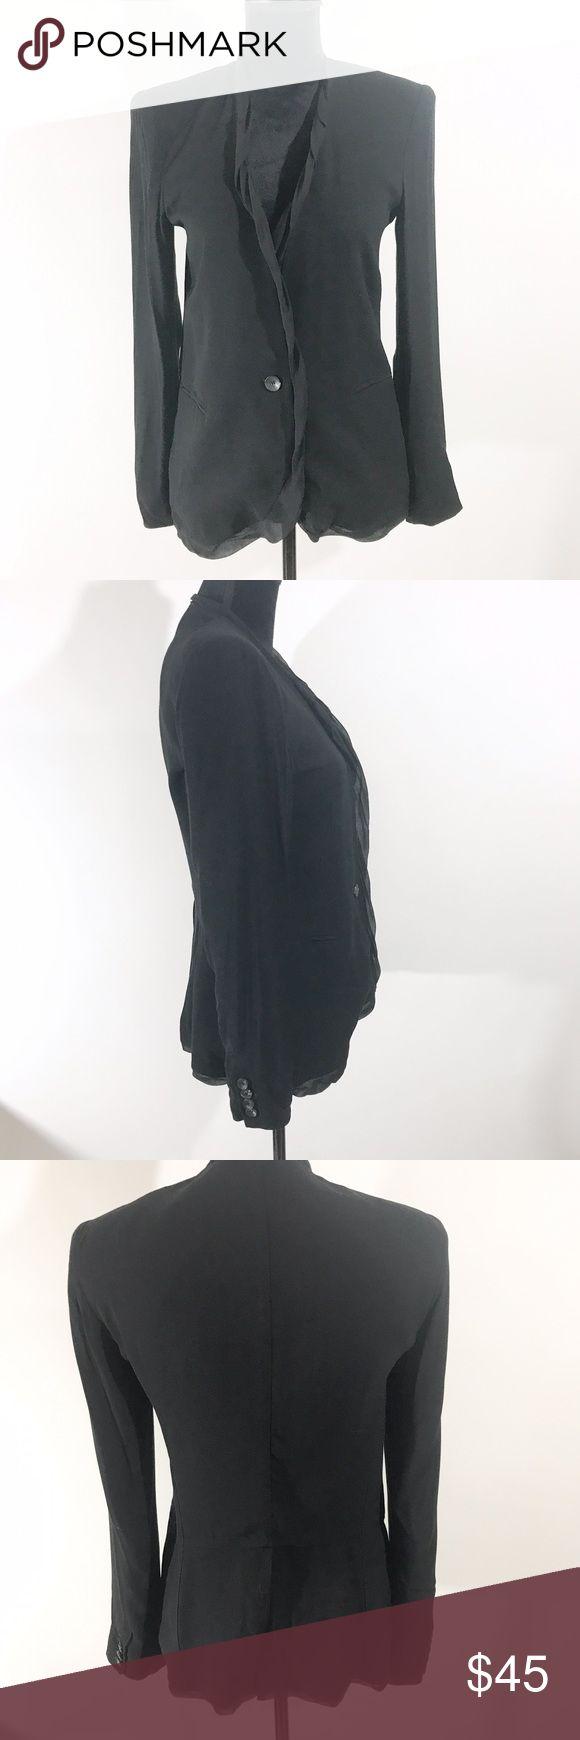 Helmut Lang Blazer Sleek black blazer with ruffle detail. Classic closet staple.   Length 26 inches  Sleeve Length 23 3/4 Bust 16 inches  Shell 100% Viscose Lining 95% Silk 5% Spandex Helmut Lang Jackets & Coats Blazers